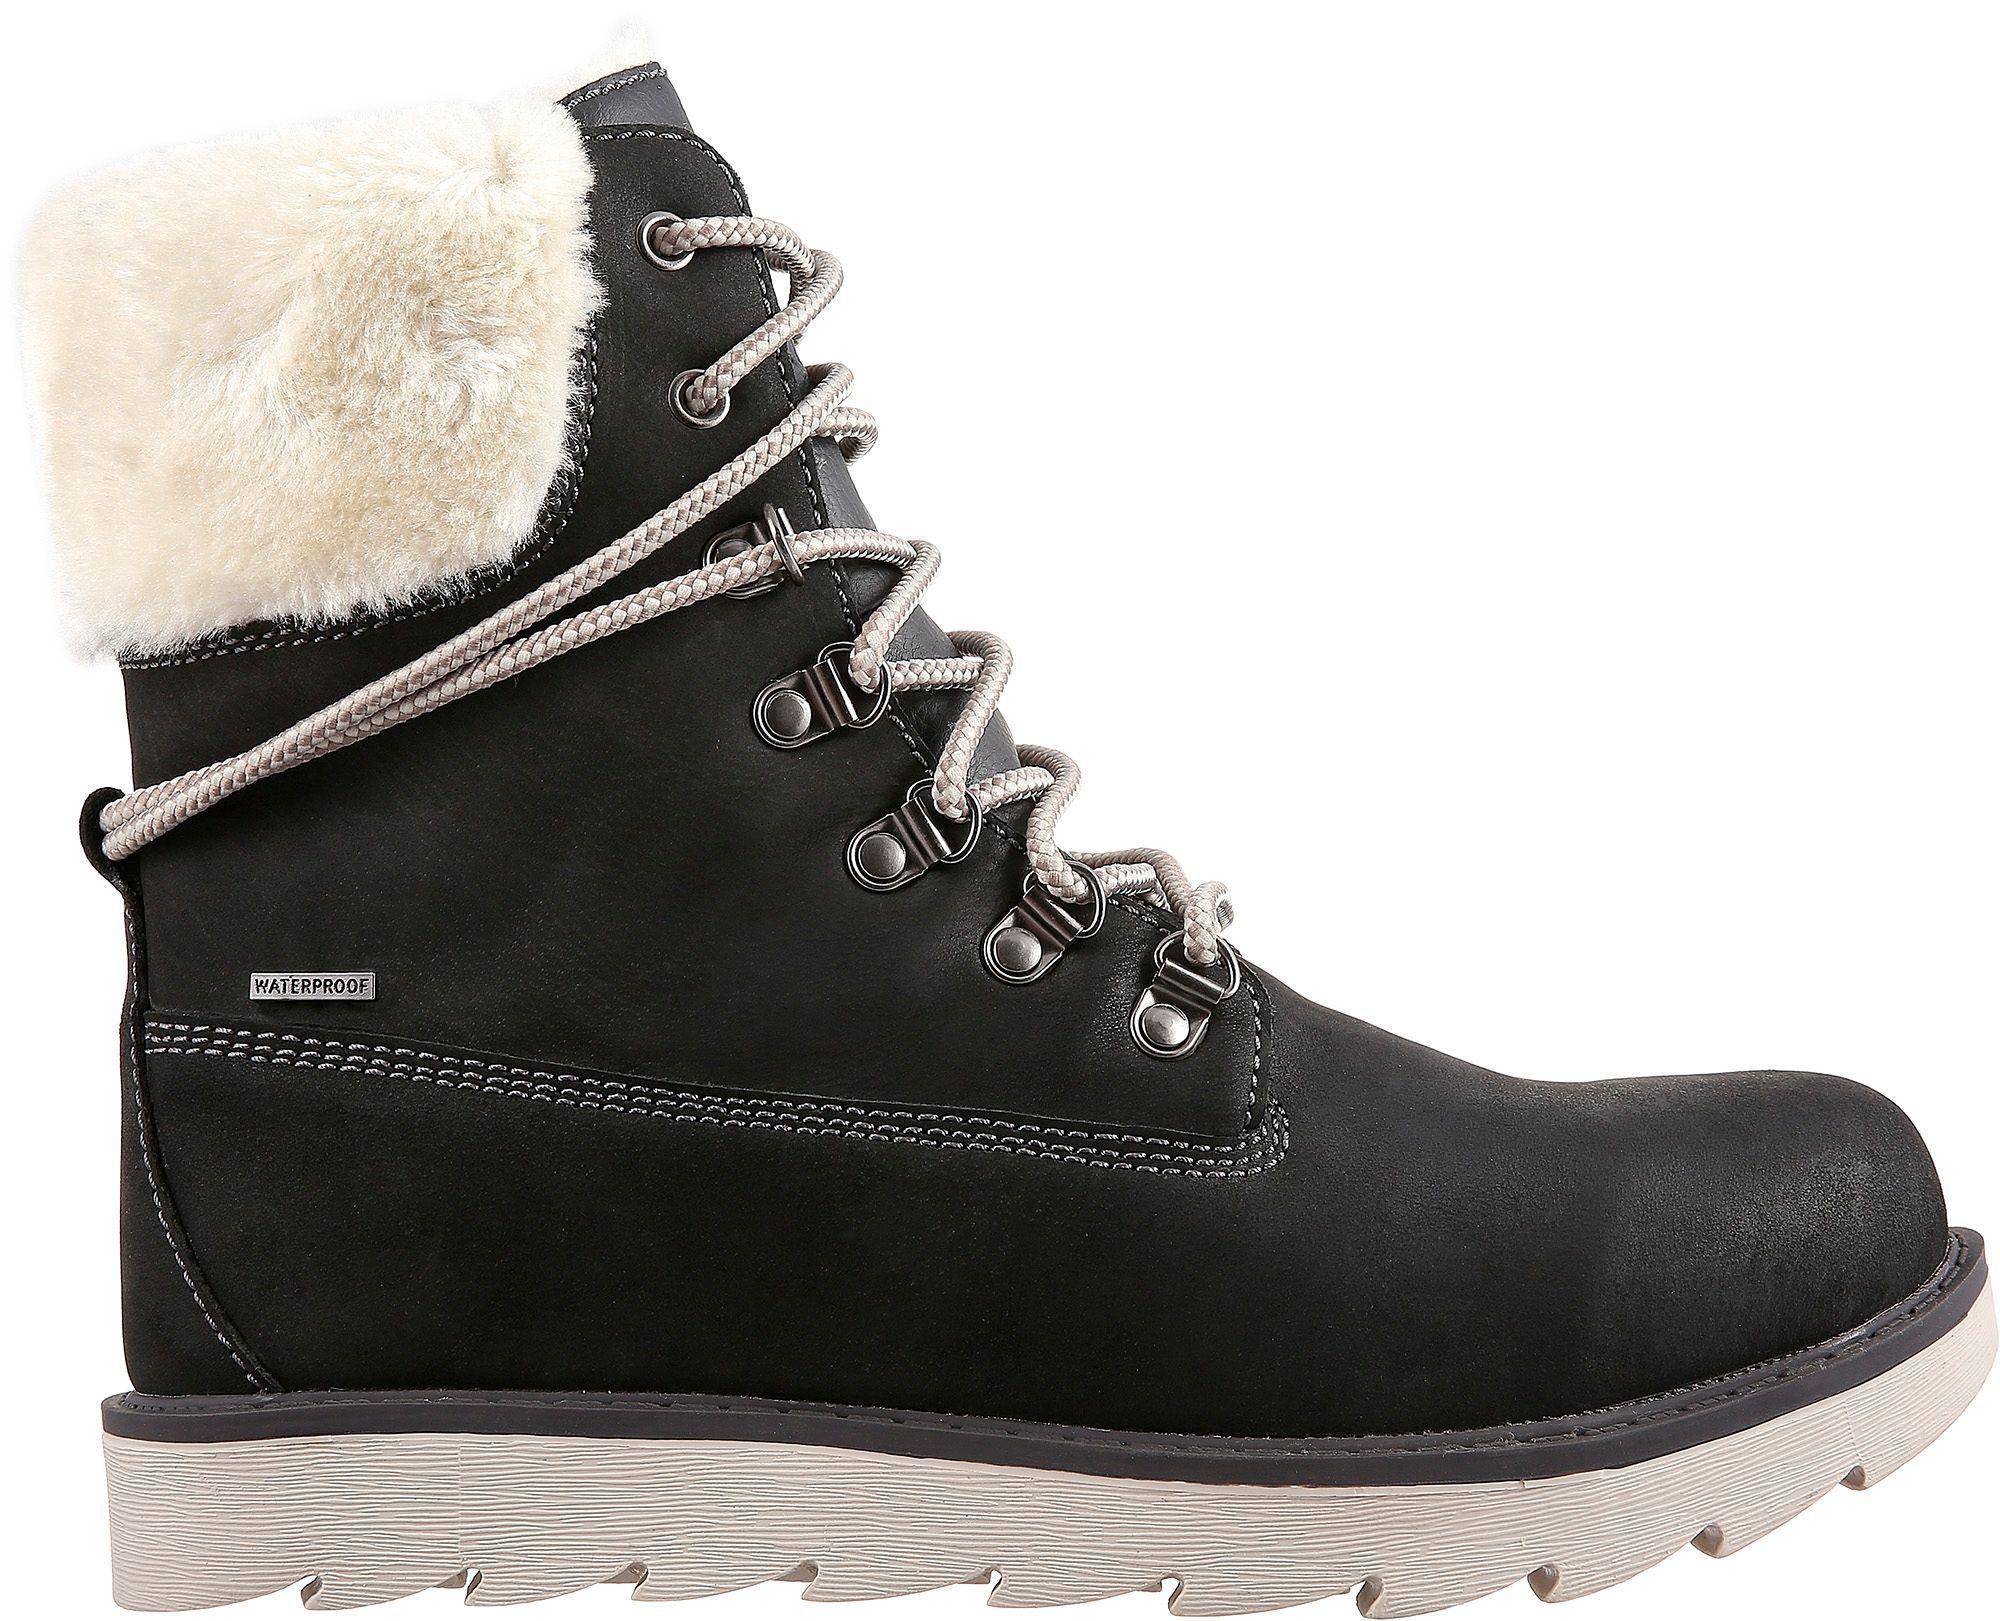 762f51162f4b0 Alpine Design Women s Ember Ridge 200g Waterproof Winter Boots ...